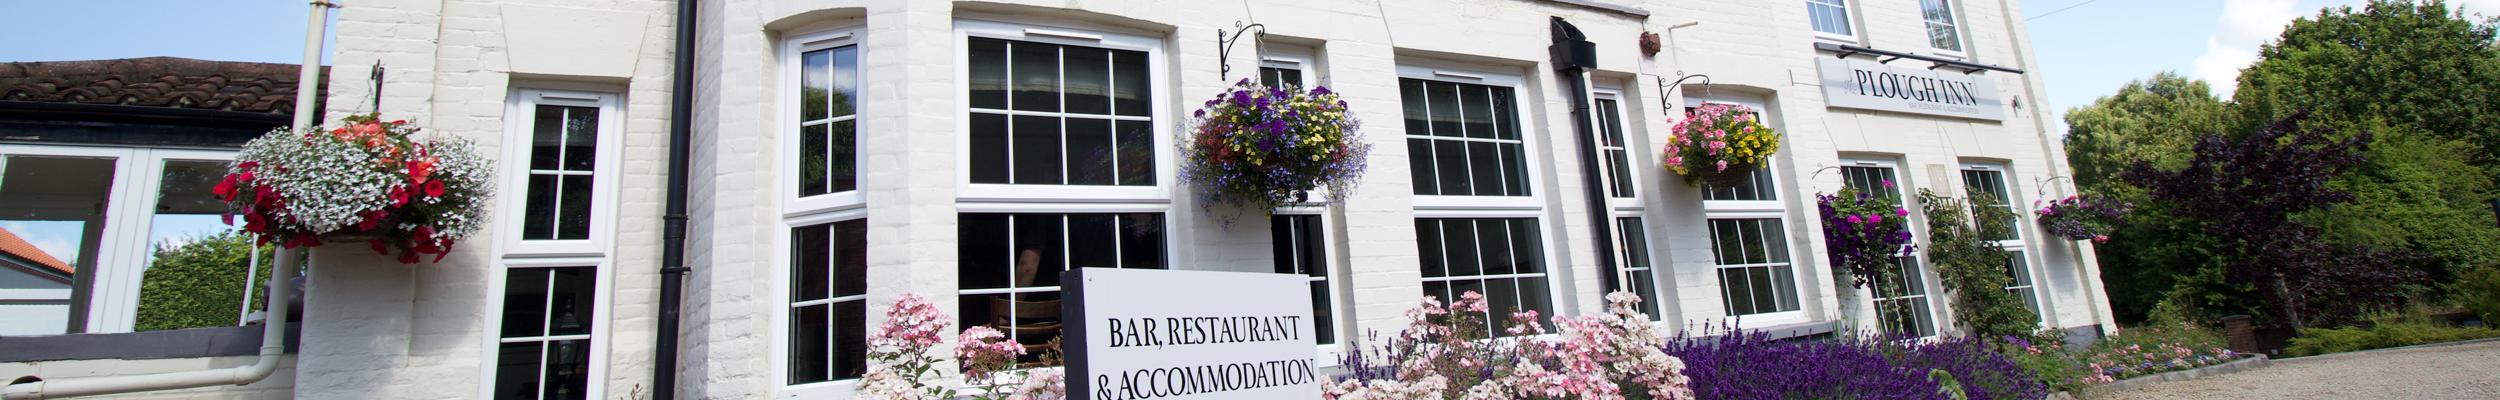 Reviews // Exterior shot of The Plough Inn Bar, Restaurant & Accommodation